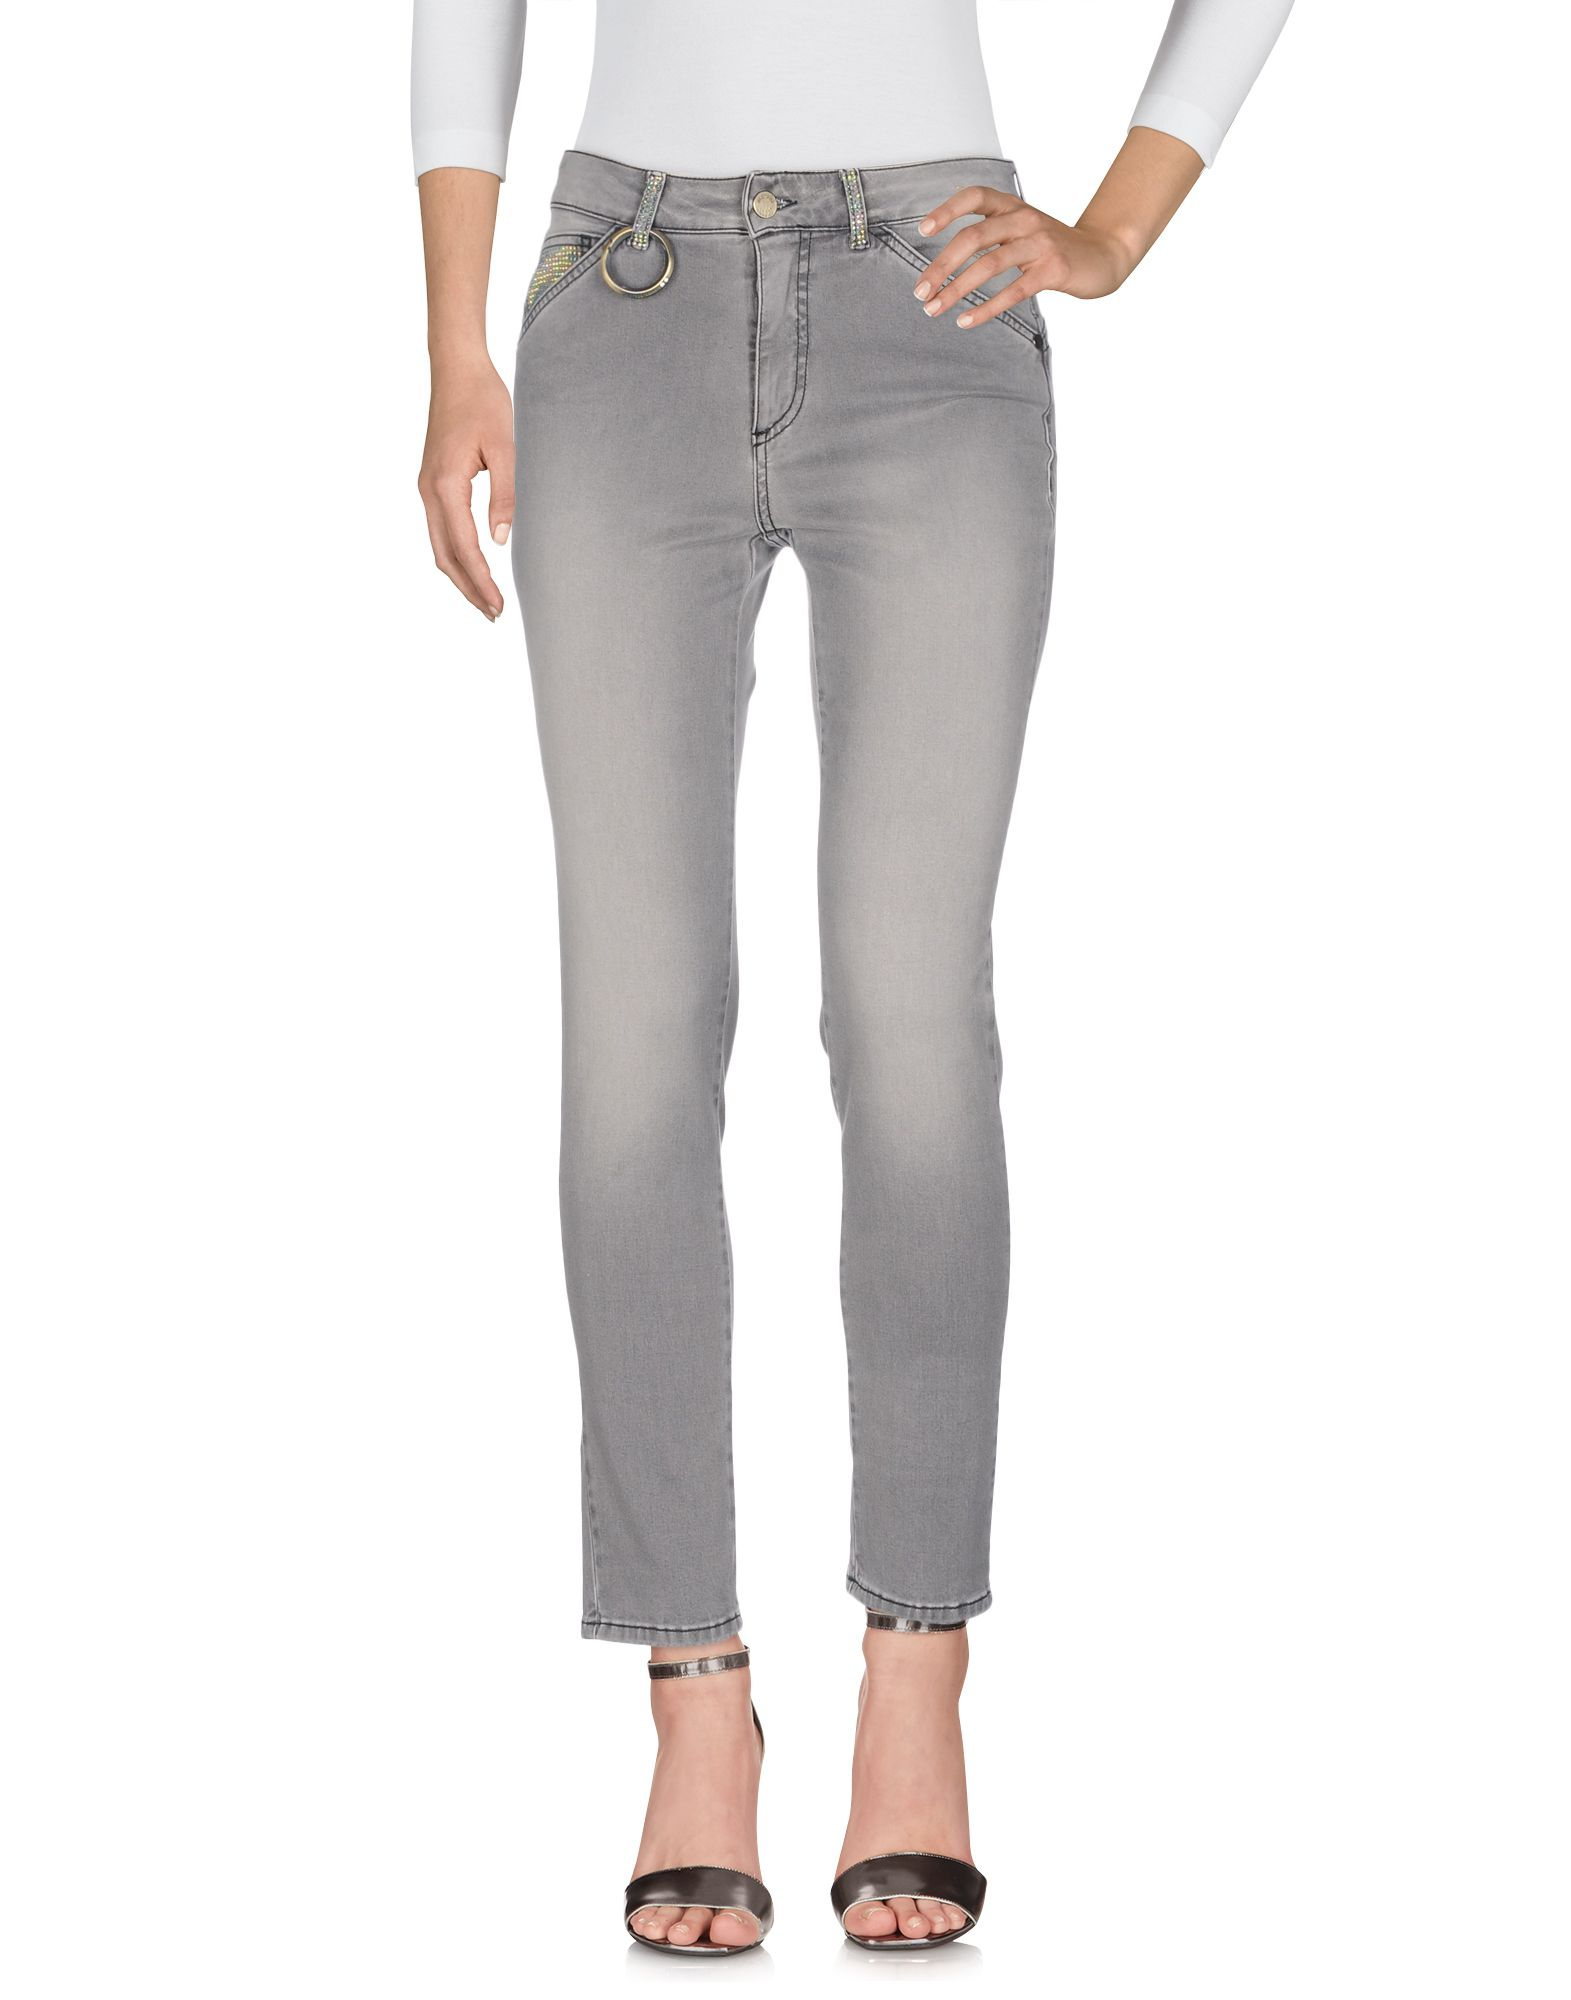 Pantaloni Jeans Marani Jeans Donna - Acquista online su IXNOt